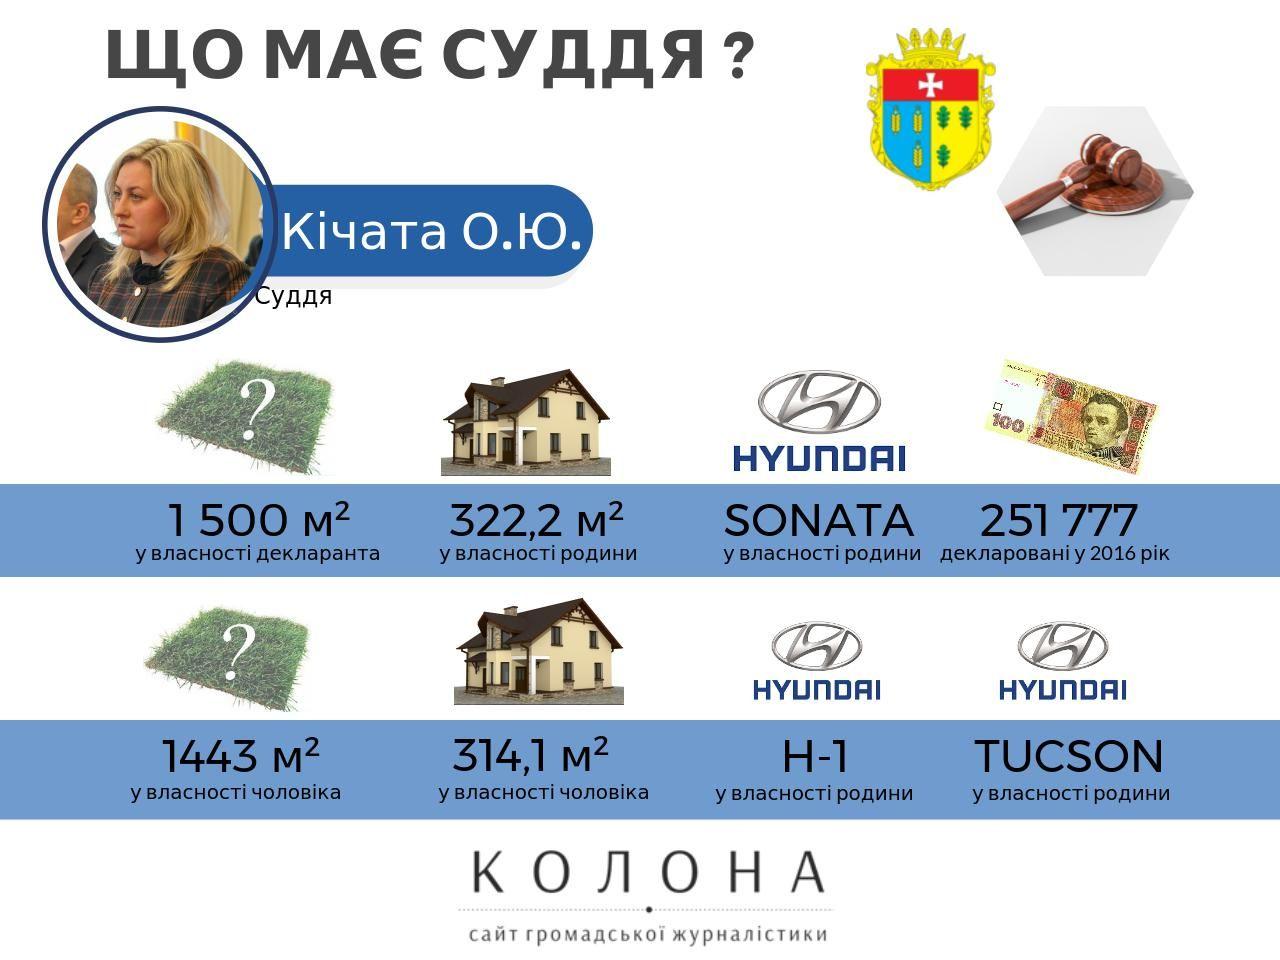 Суддя Кічата Олександра Дубно 1